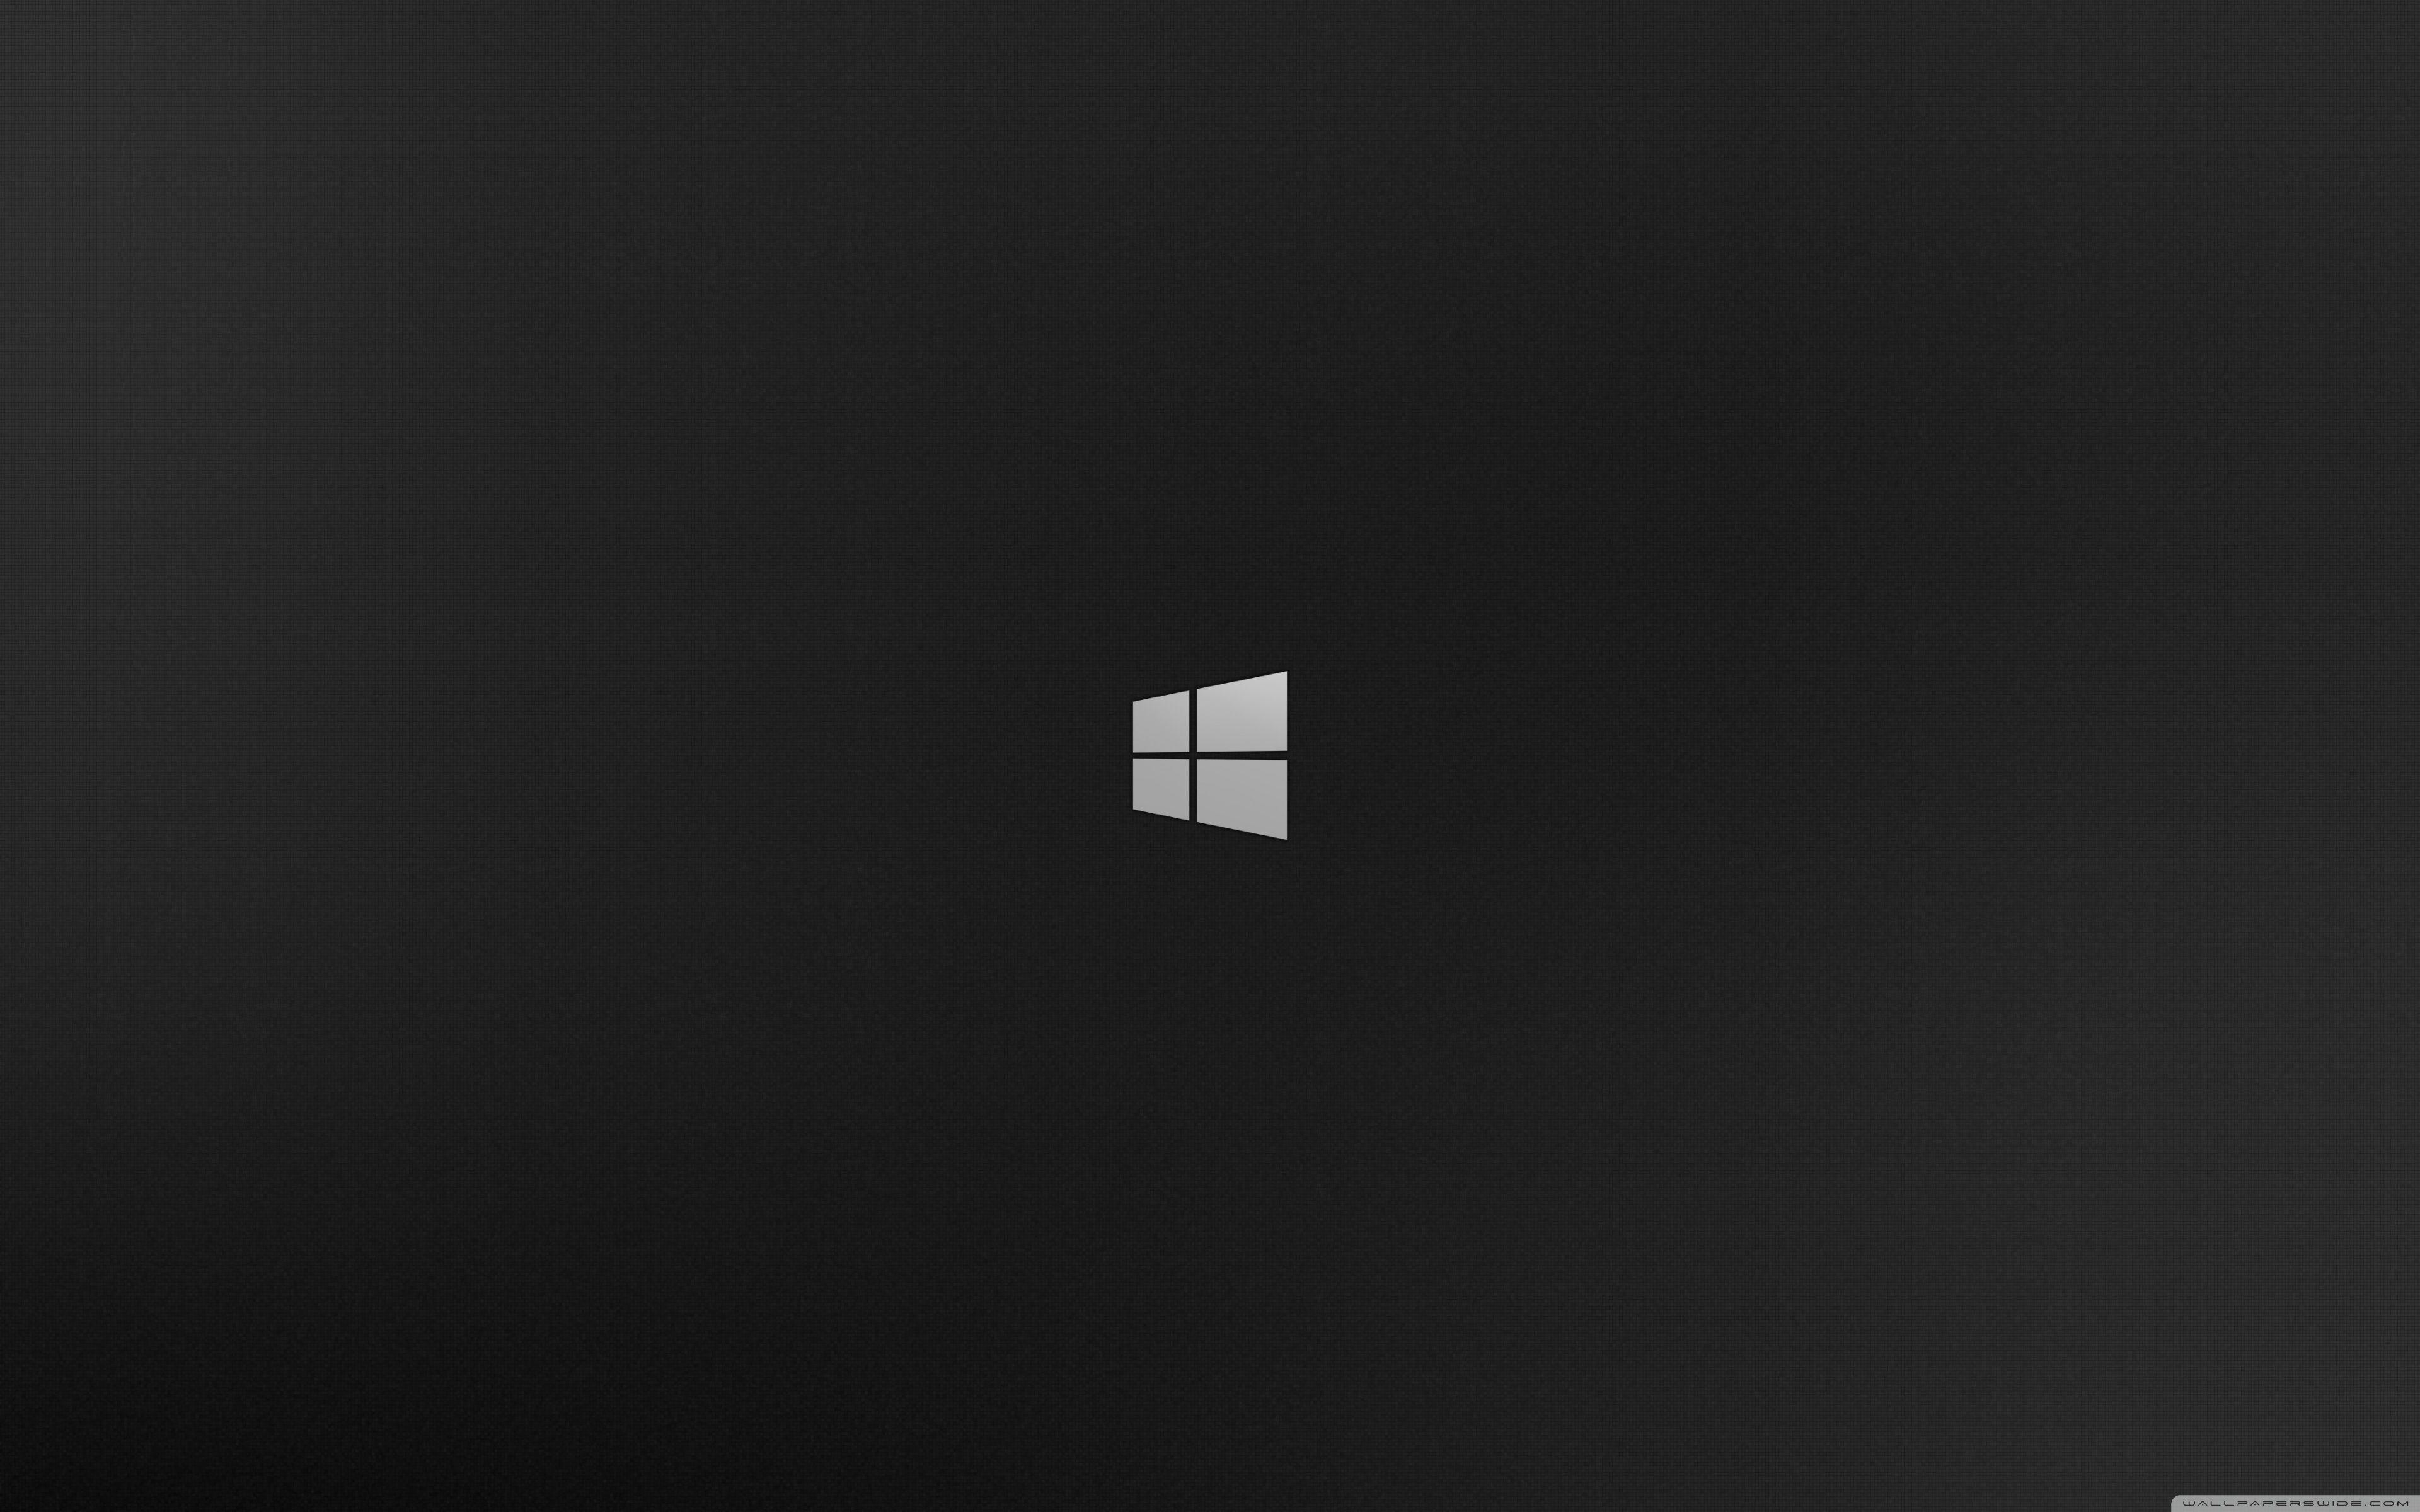 wallpaperswidecom windows 10 hd desktop wallpapers for